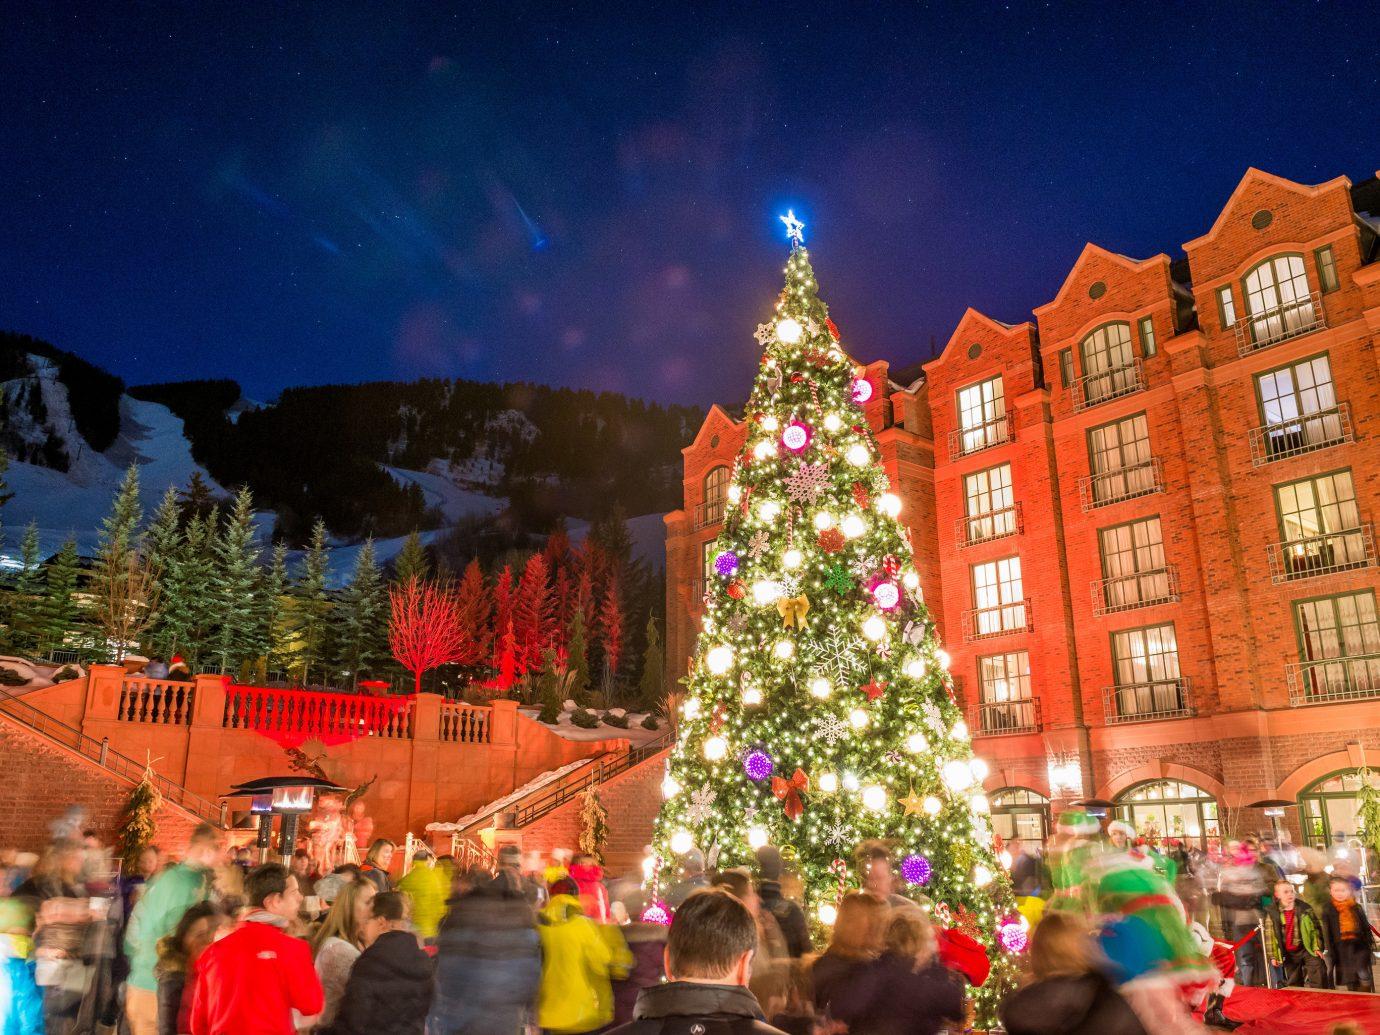 Hotels tree outdoor Christmas Christmas tree christmas decoration holiday Resort crowd line